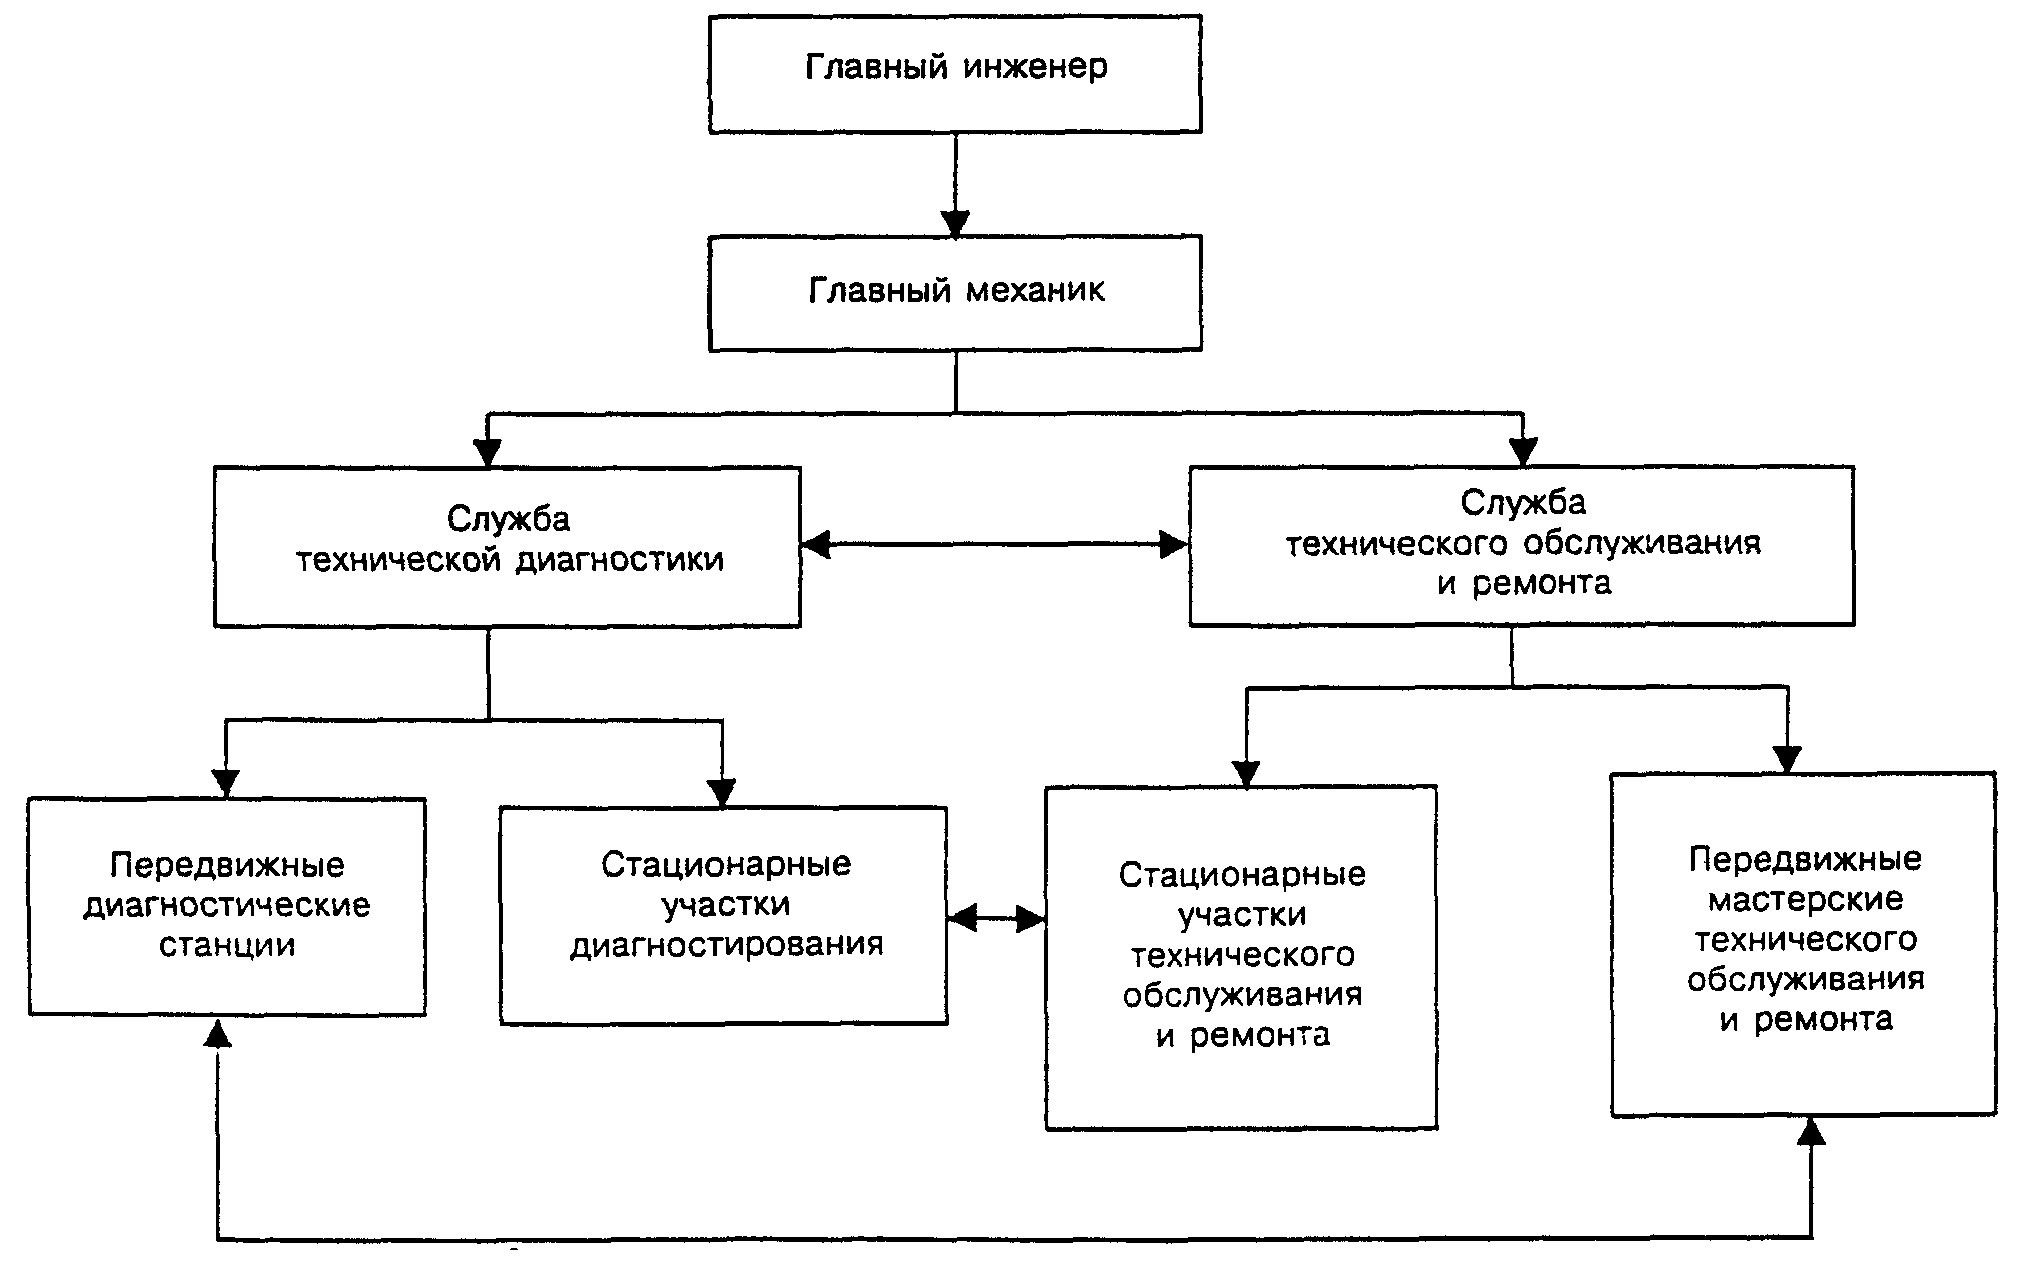 бланк наряд-допуск форма 2